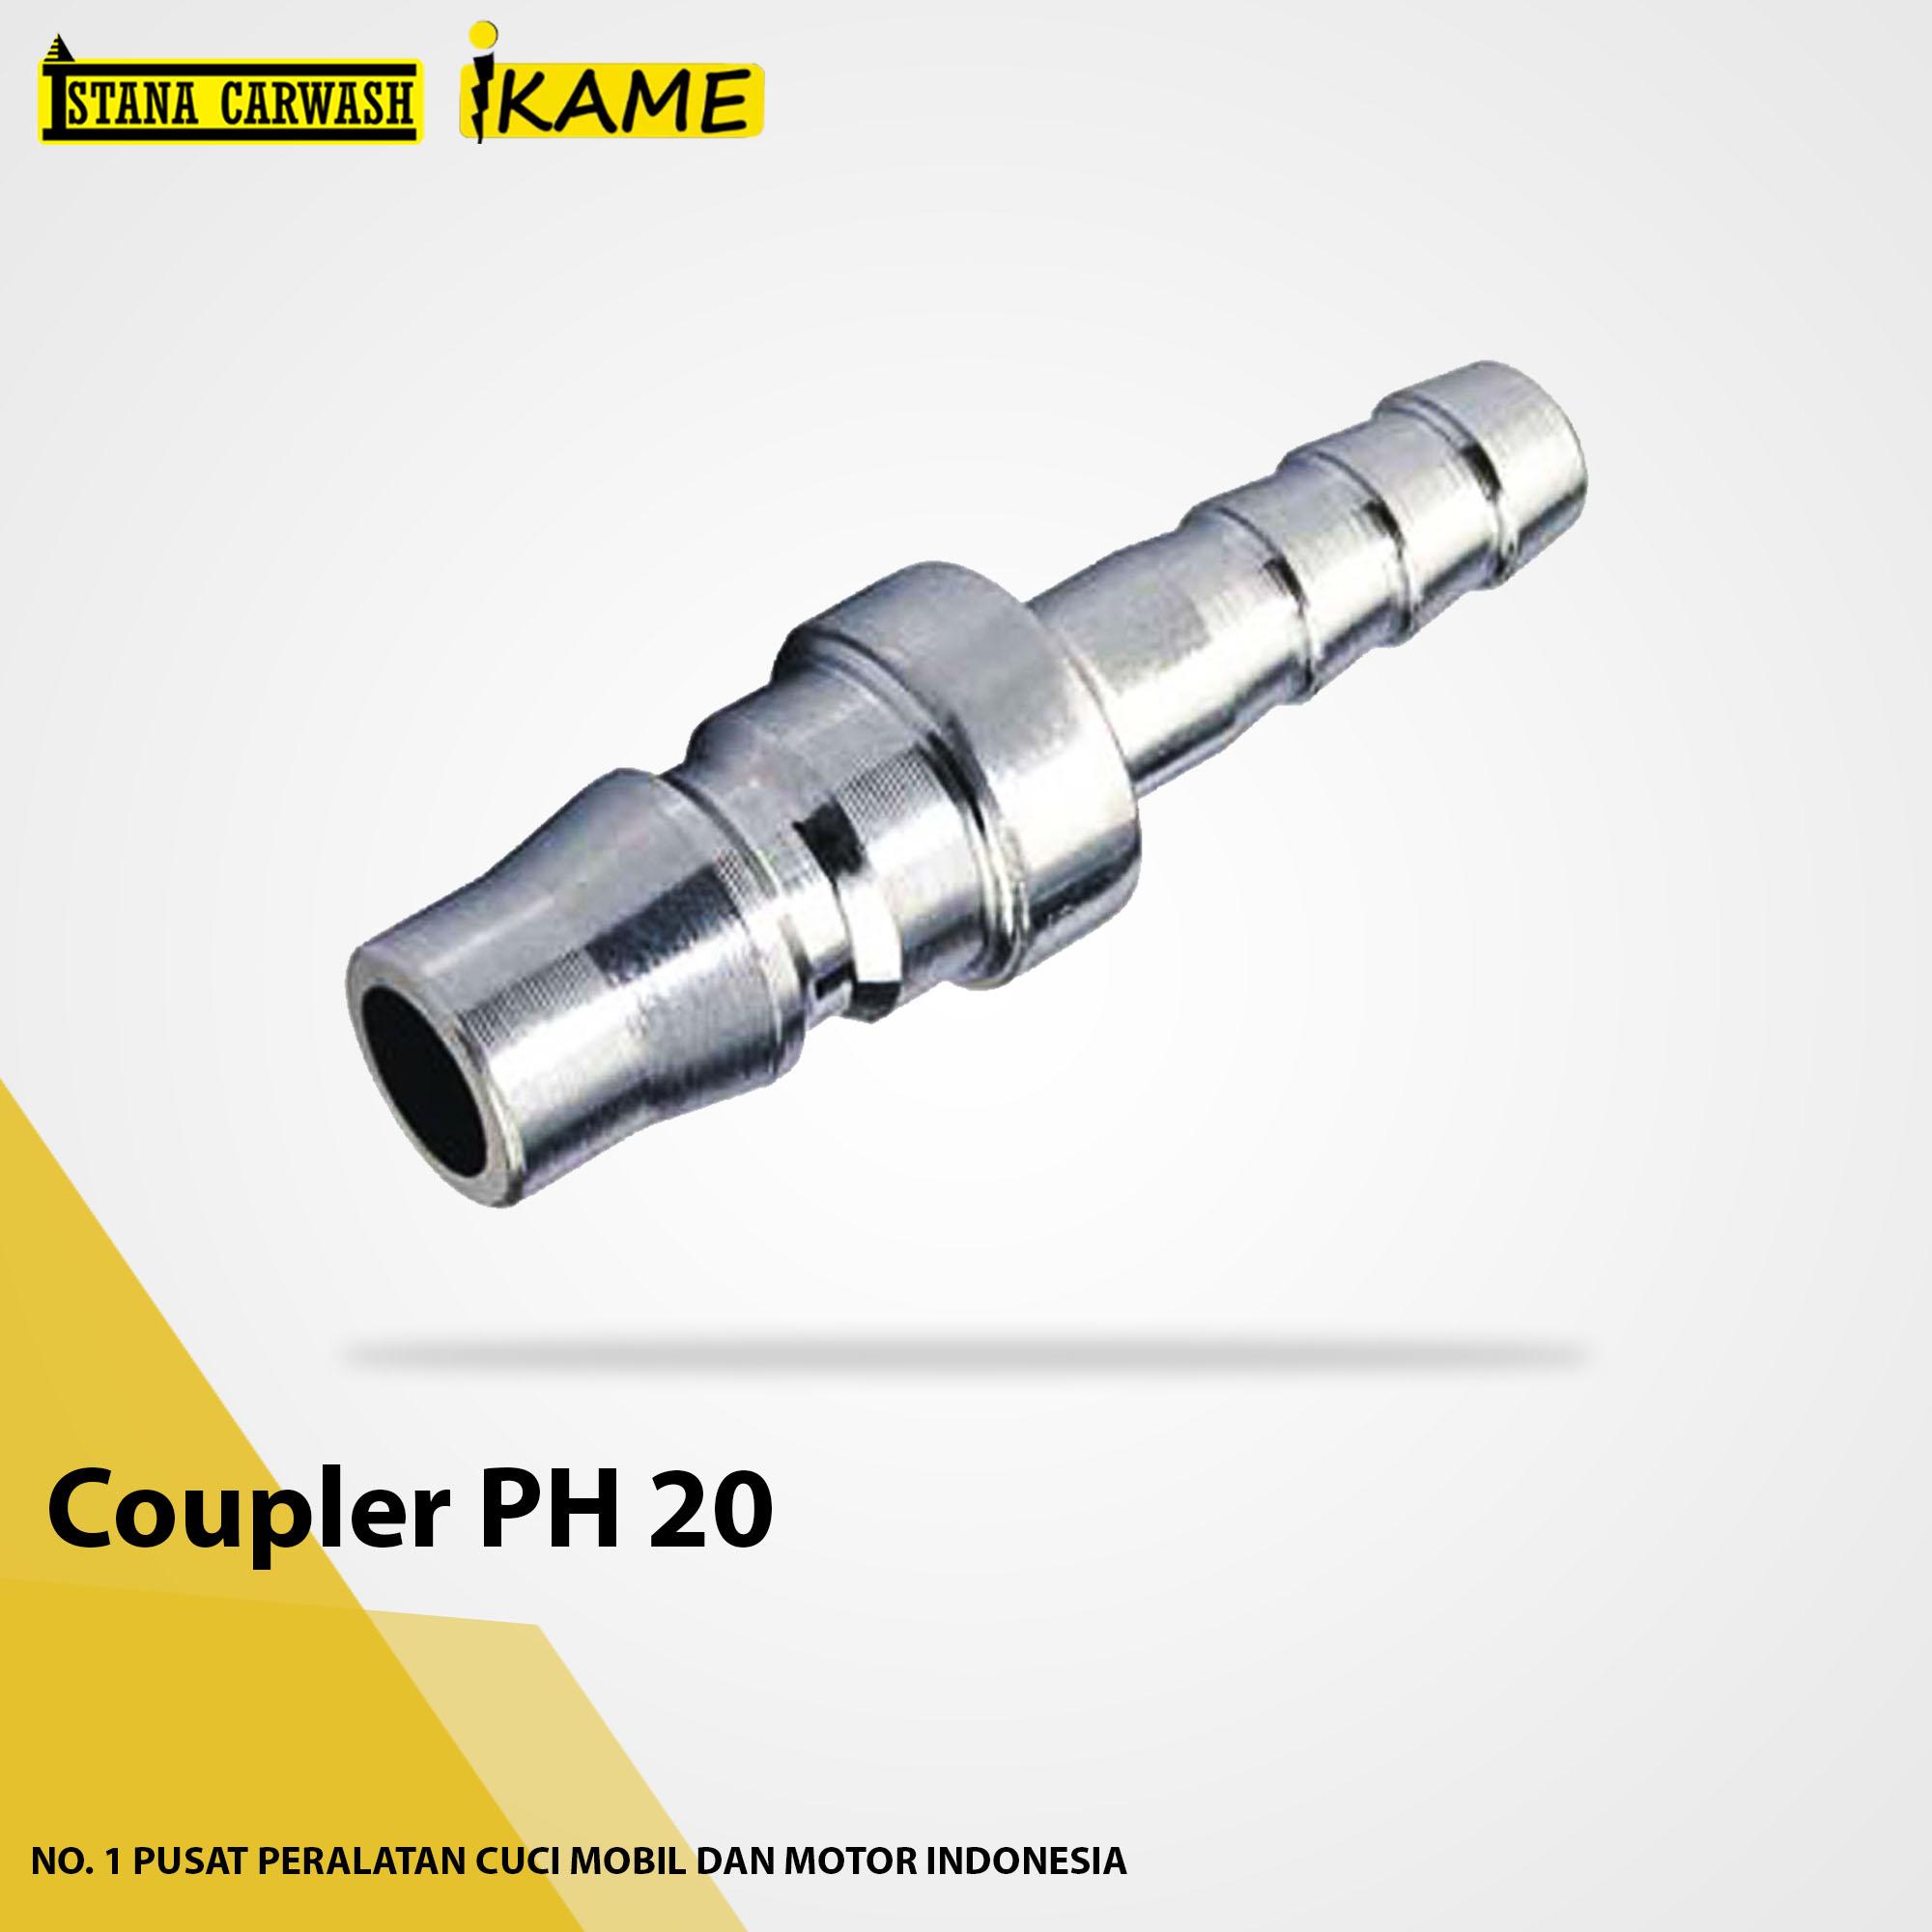 Coupler PH 20